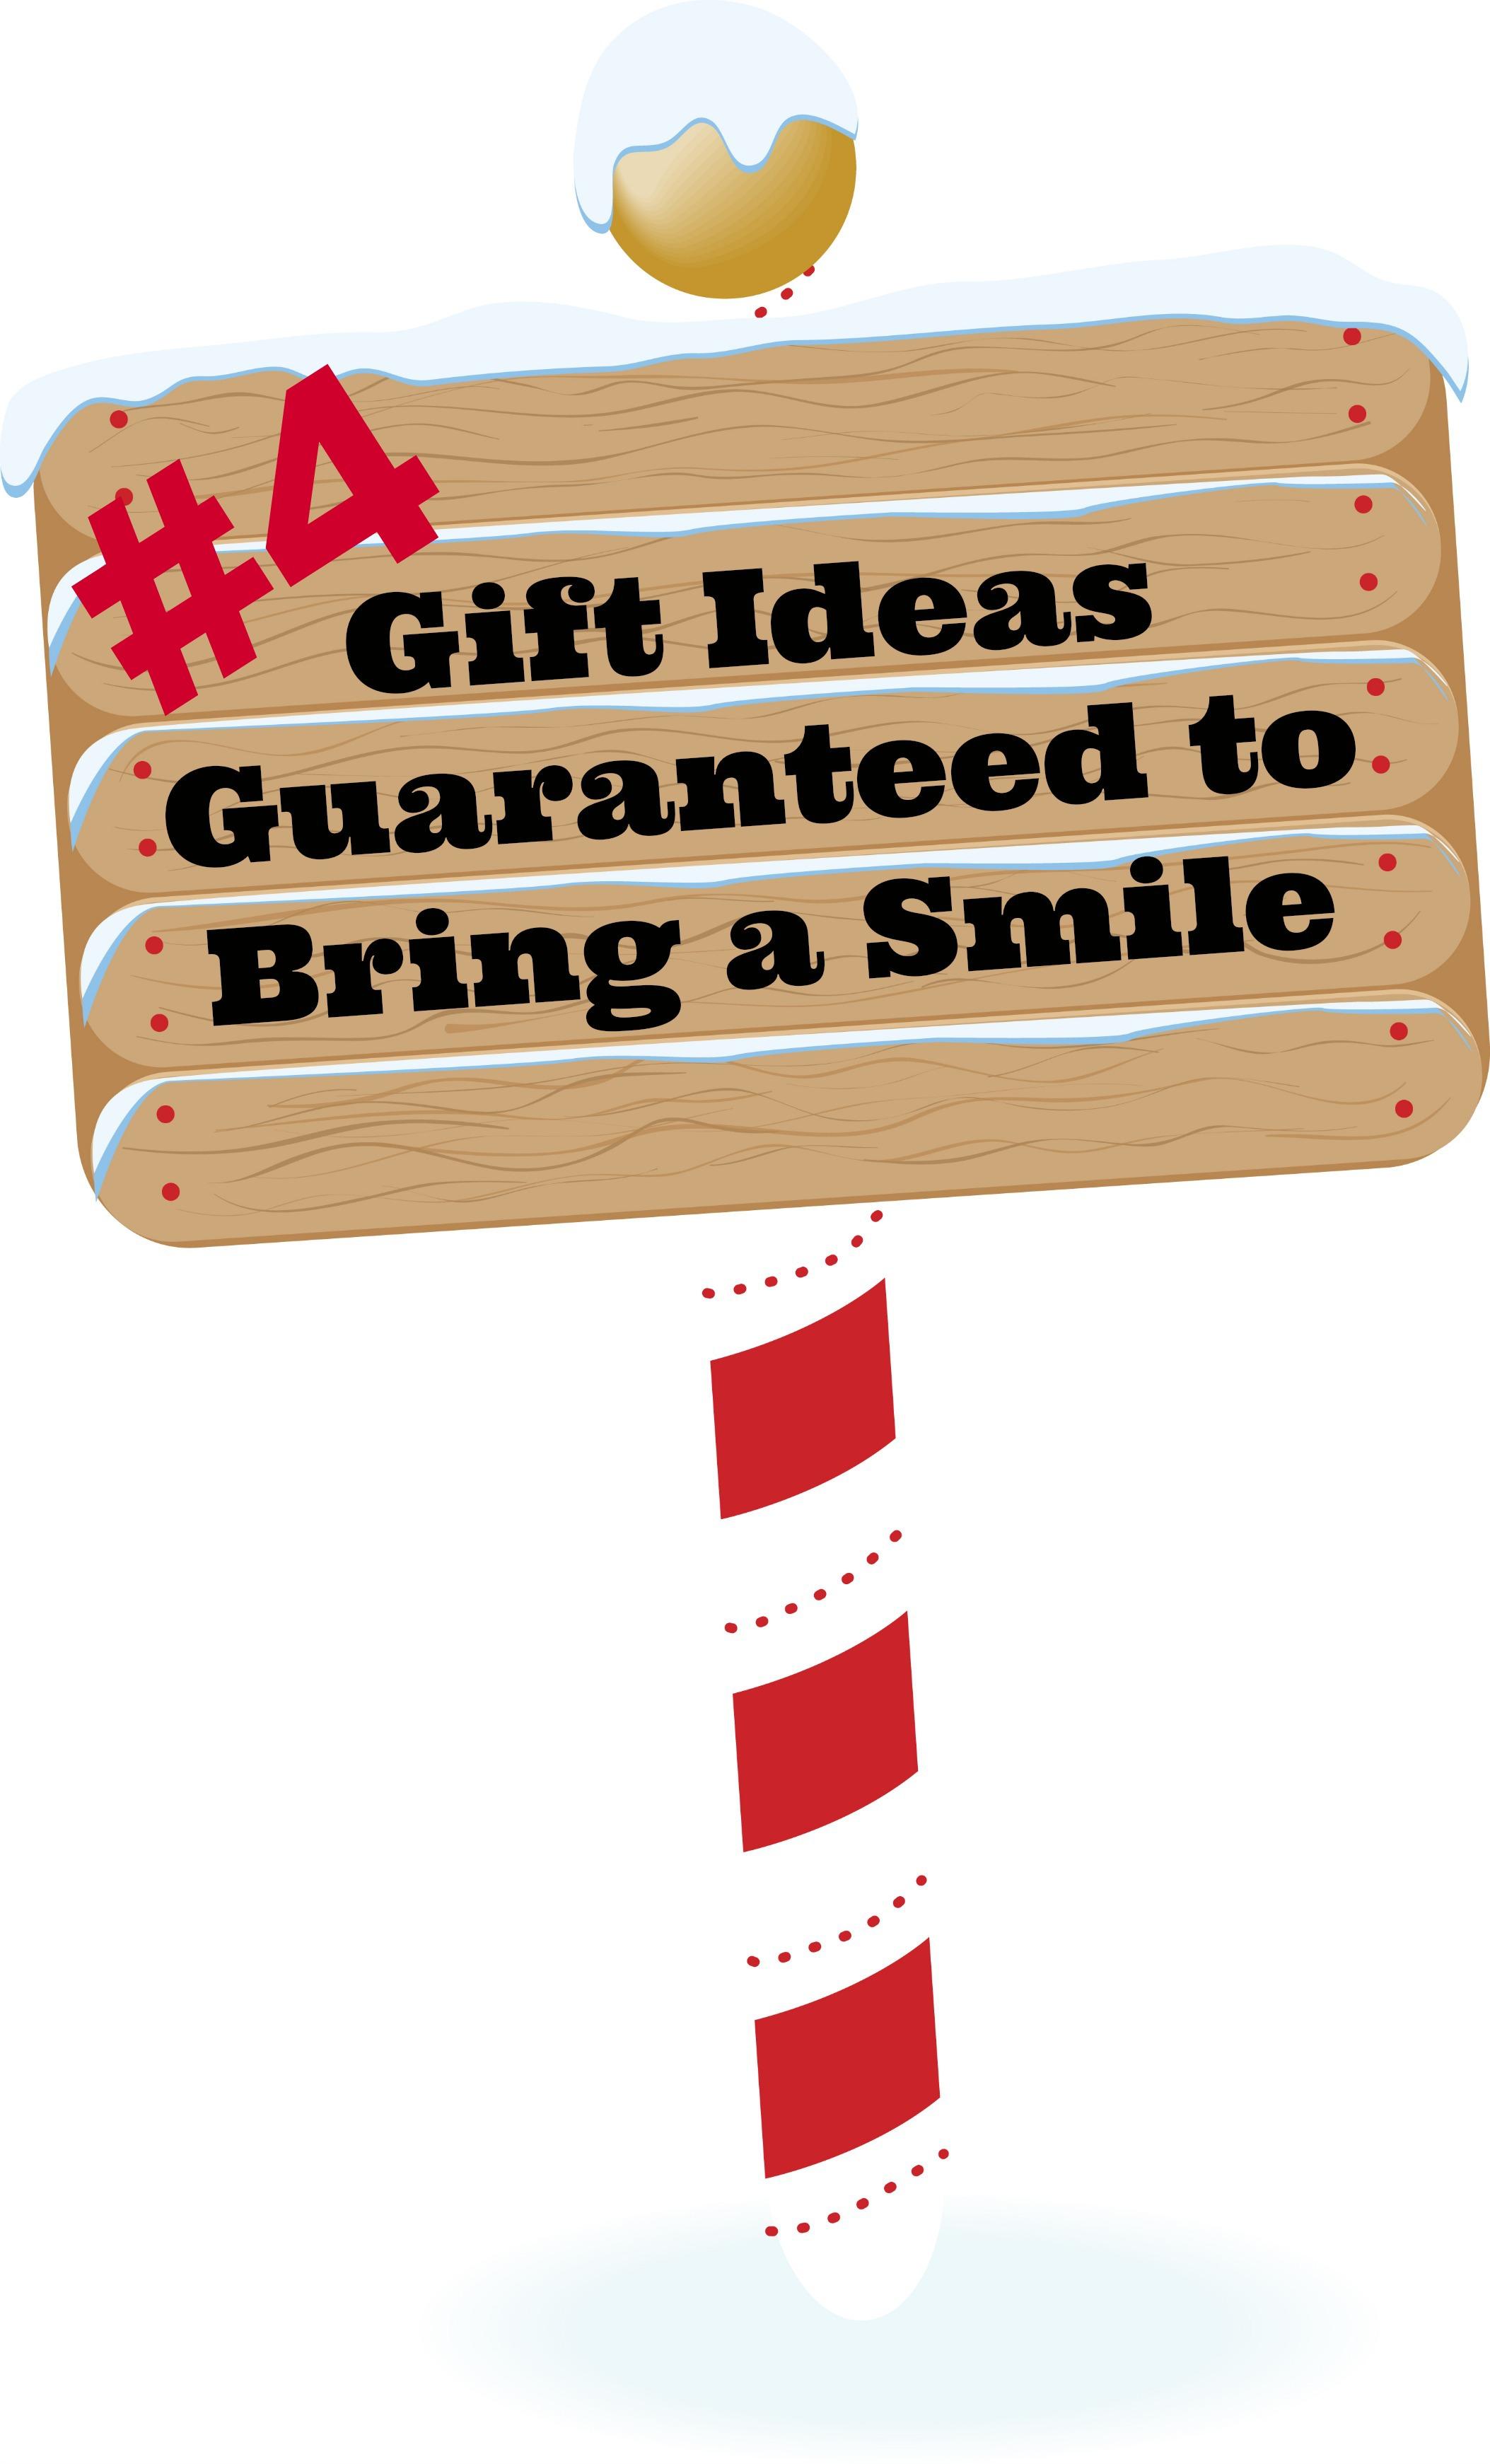 gift idea #4